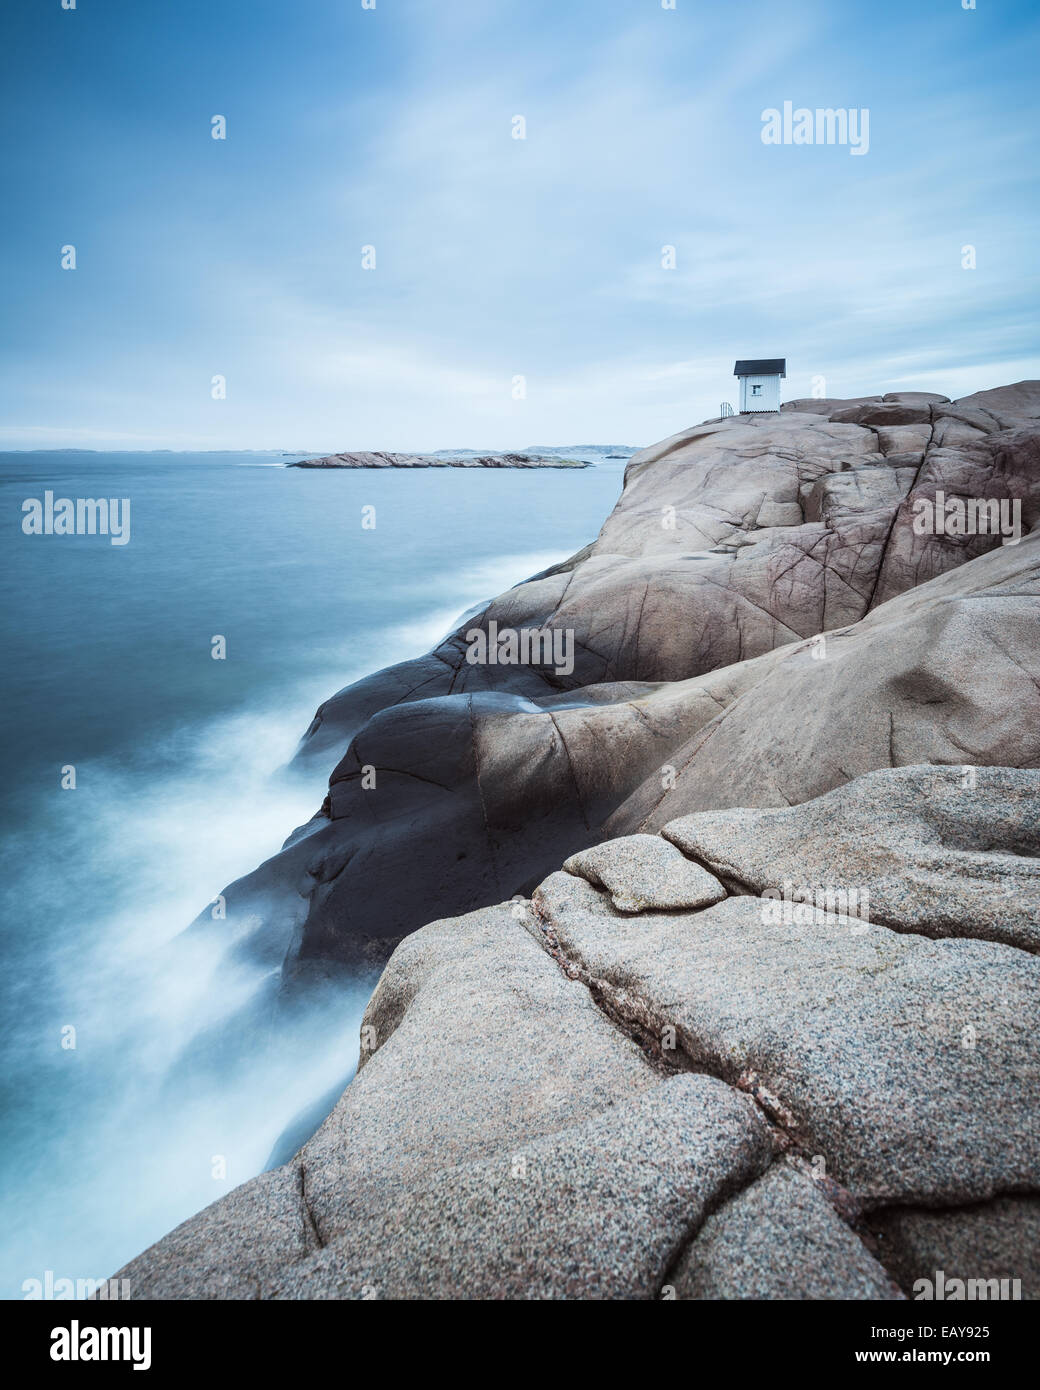 Cabaña sobre un acantilado cerca del mar con impresionantes sky Imagen De Stock